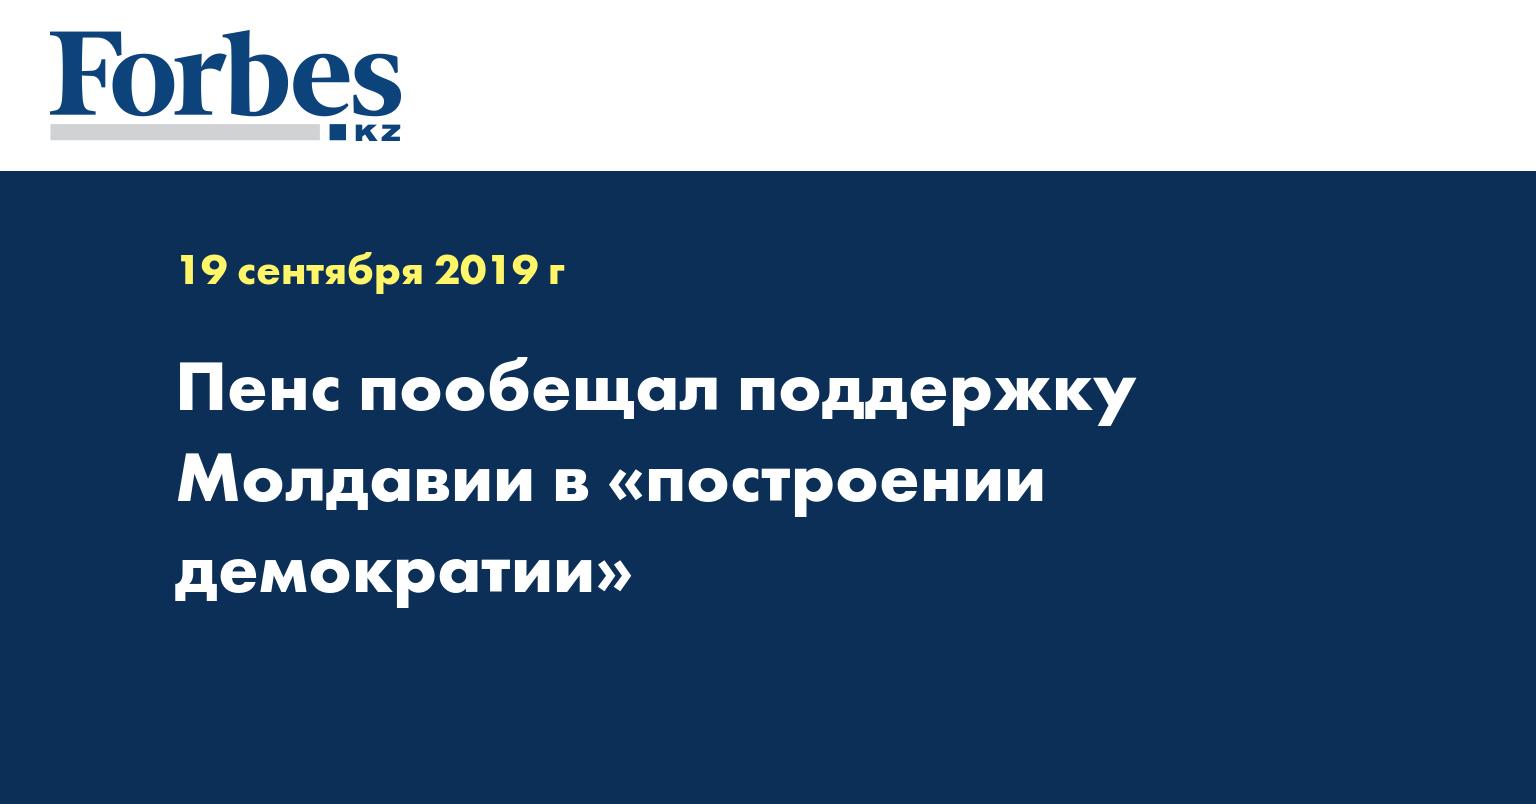 Пенс пообещал поддержку Молдавии в «построении демократии»